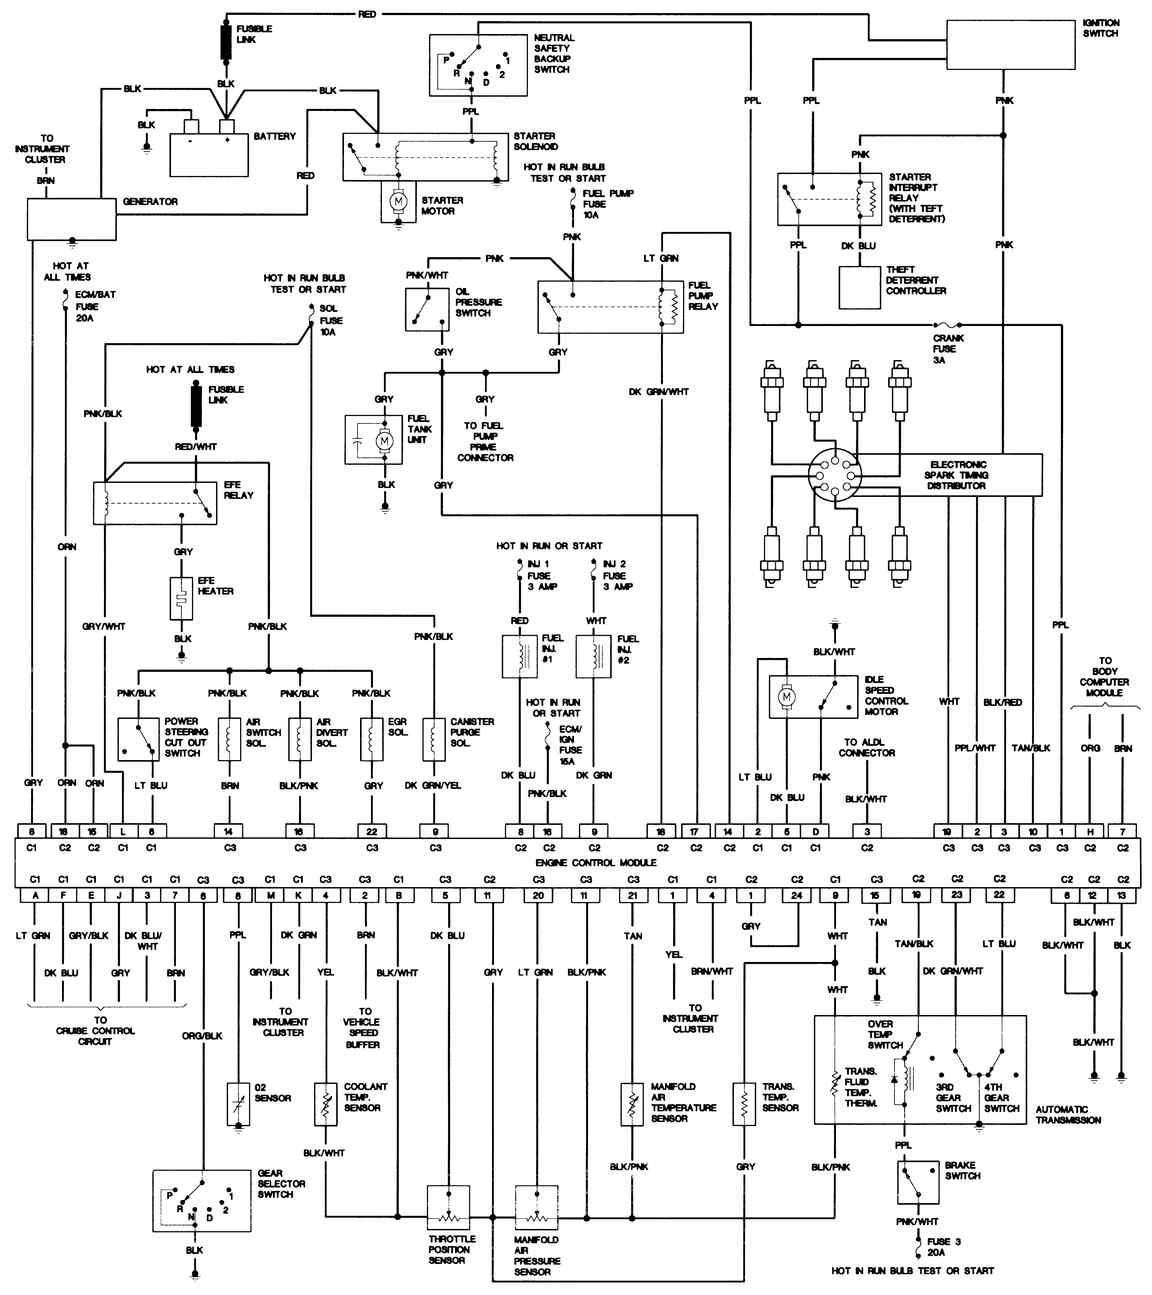 coachman pastiche wiring diagram 2007 dodge ram radio wire 1995 schematic fleetwood bounder coachmen catalina motorhome